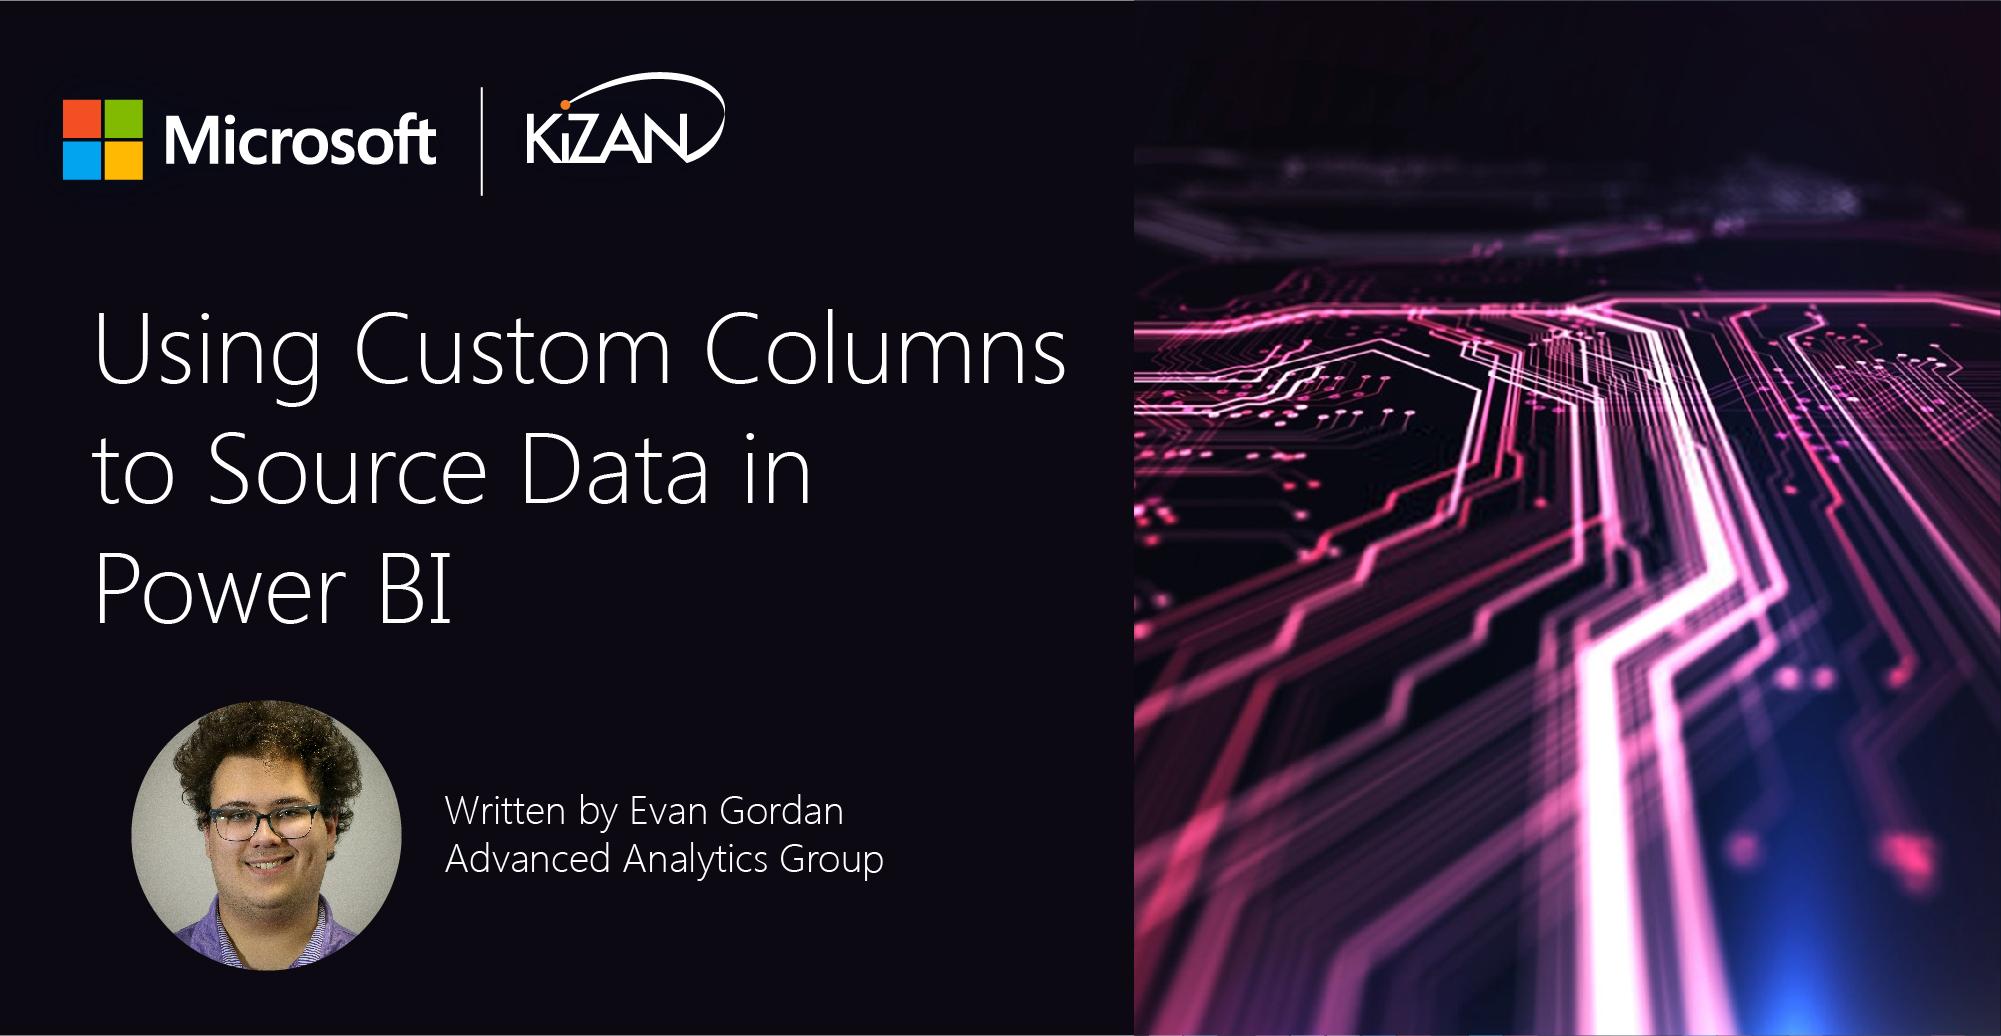 Using Custom Columns to Source Data in Power BI